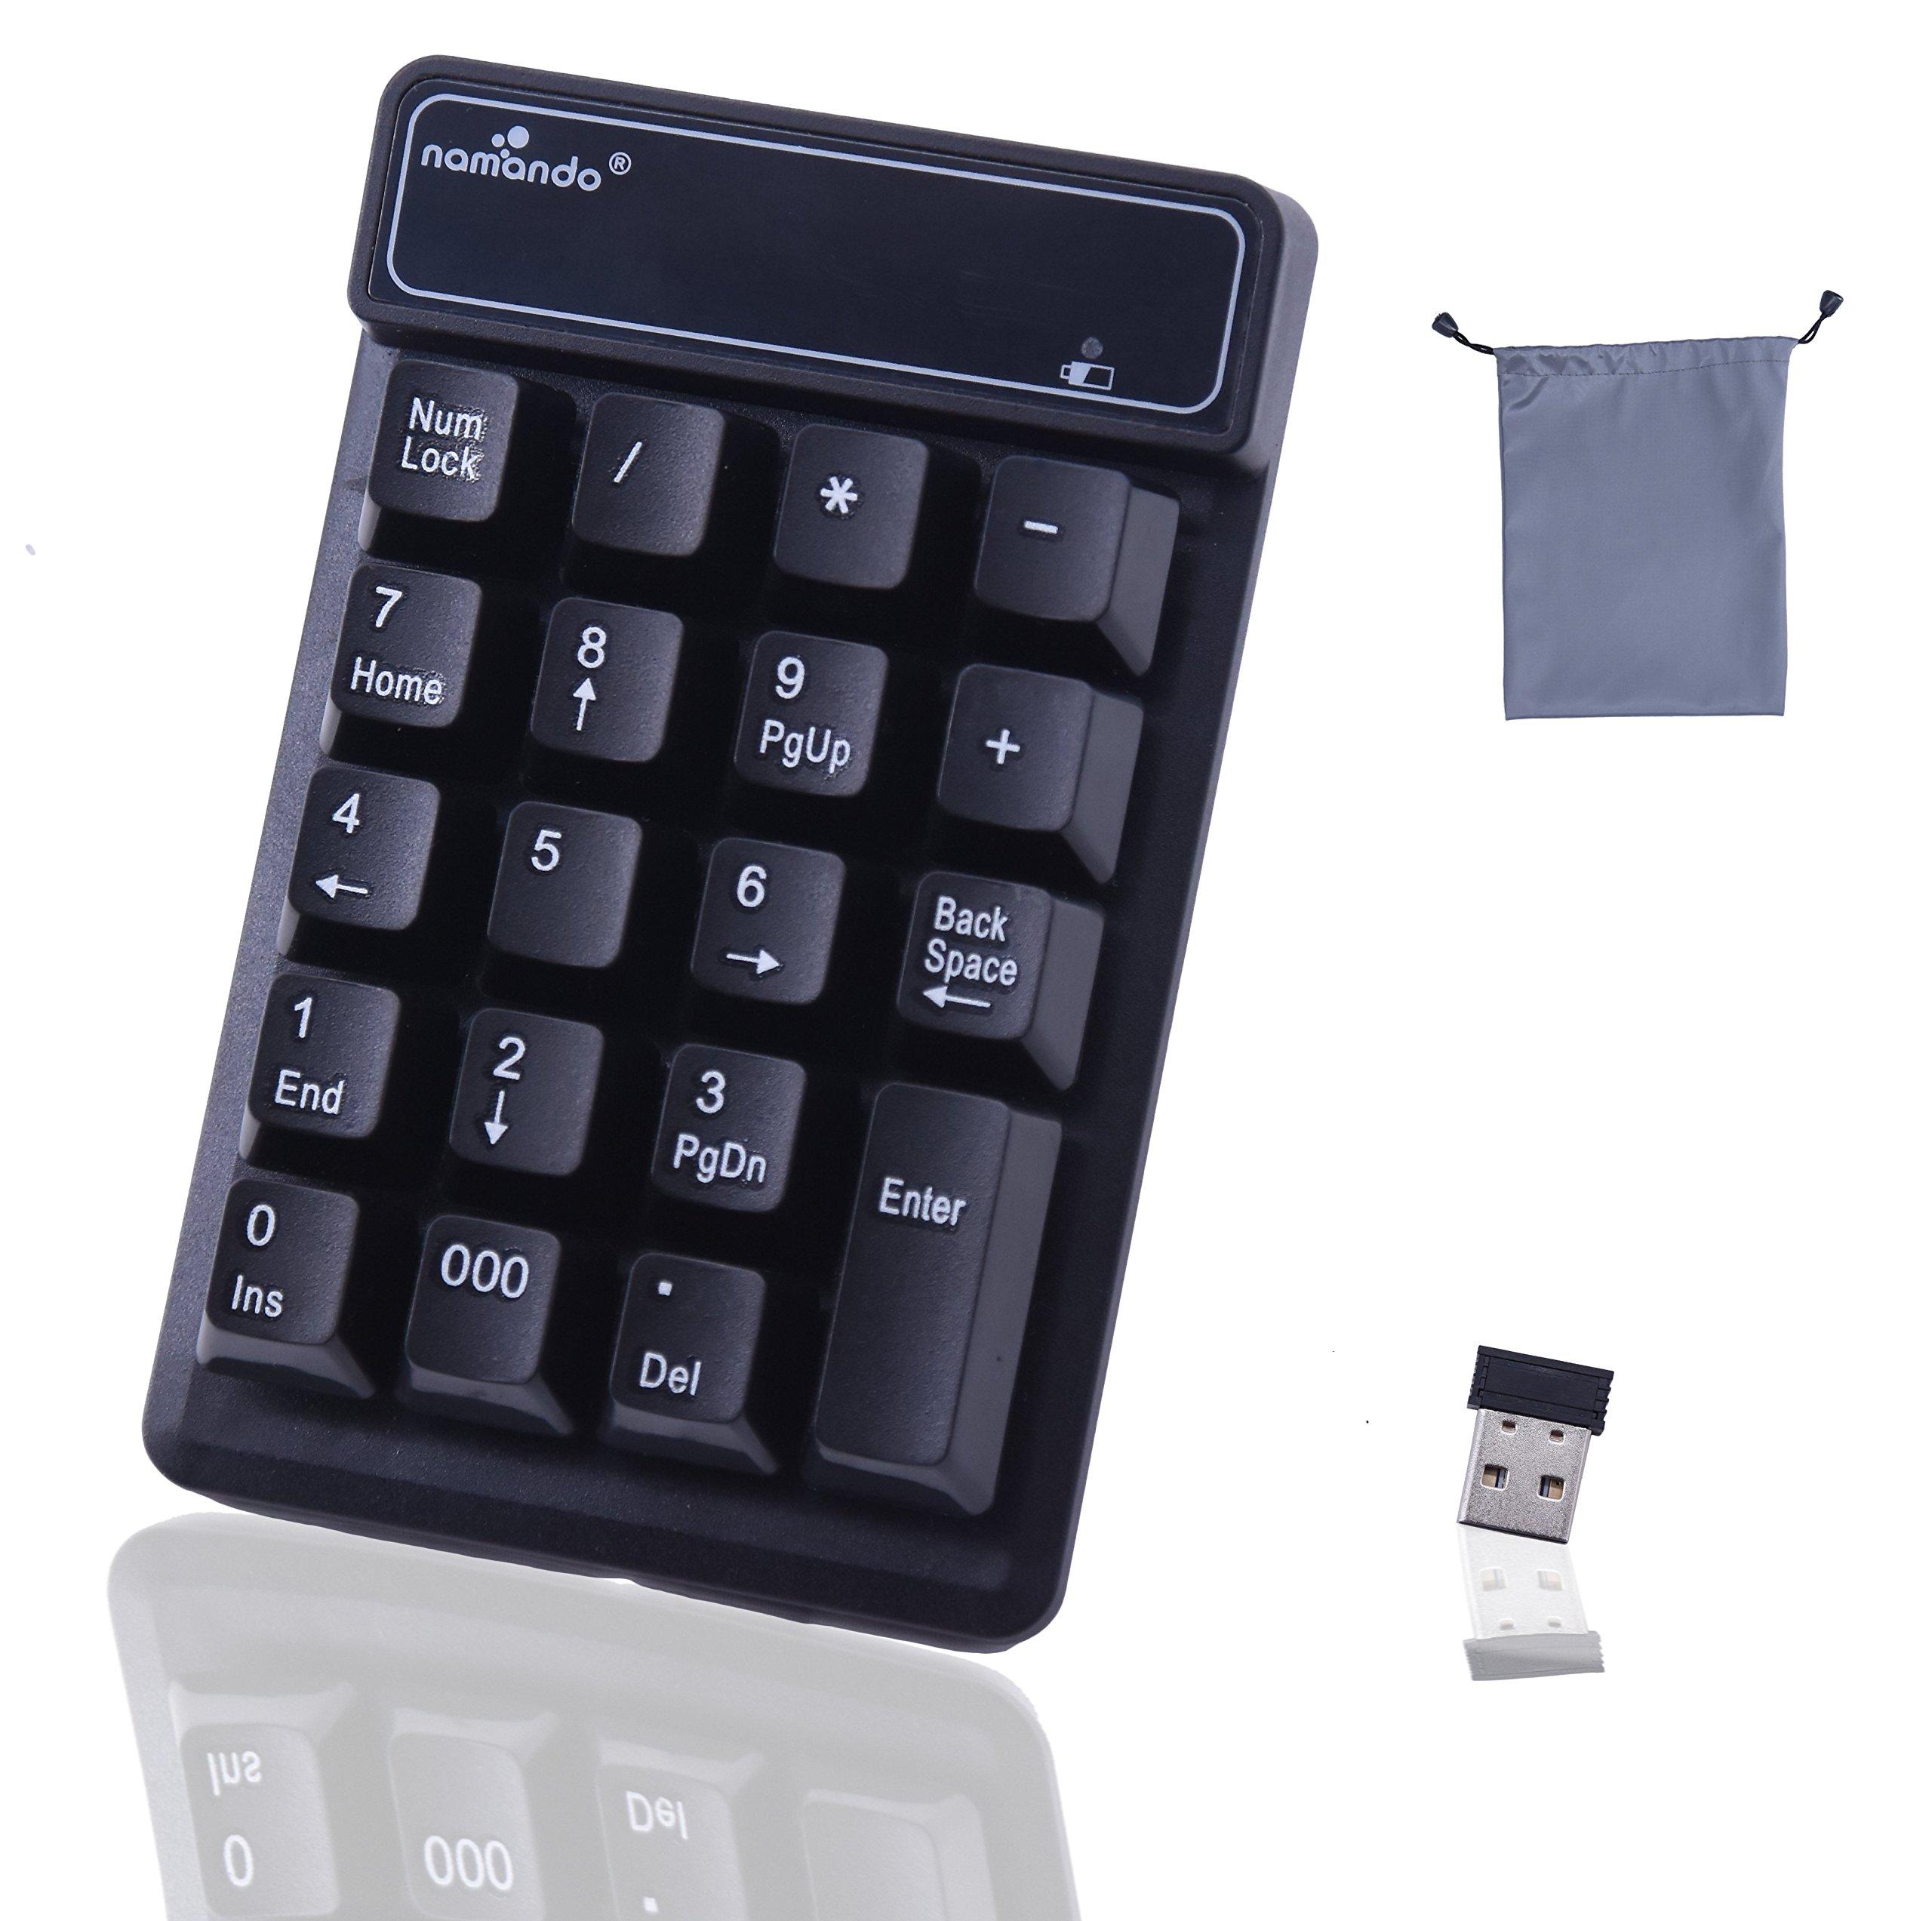 YXFLY 2.4GHz Mini USB Wireless Numeric Keypad - 19 Keys Mechanical Feel Number Pad Water-proof Keyboards for Laptop Desktop PC Notebook Black